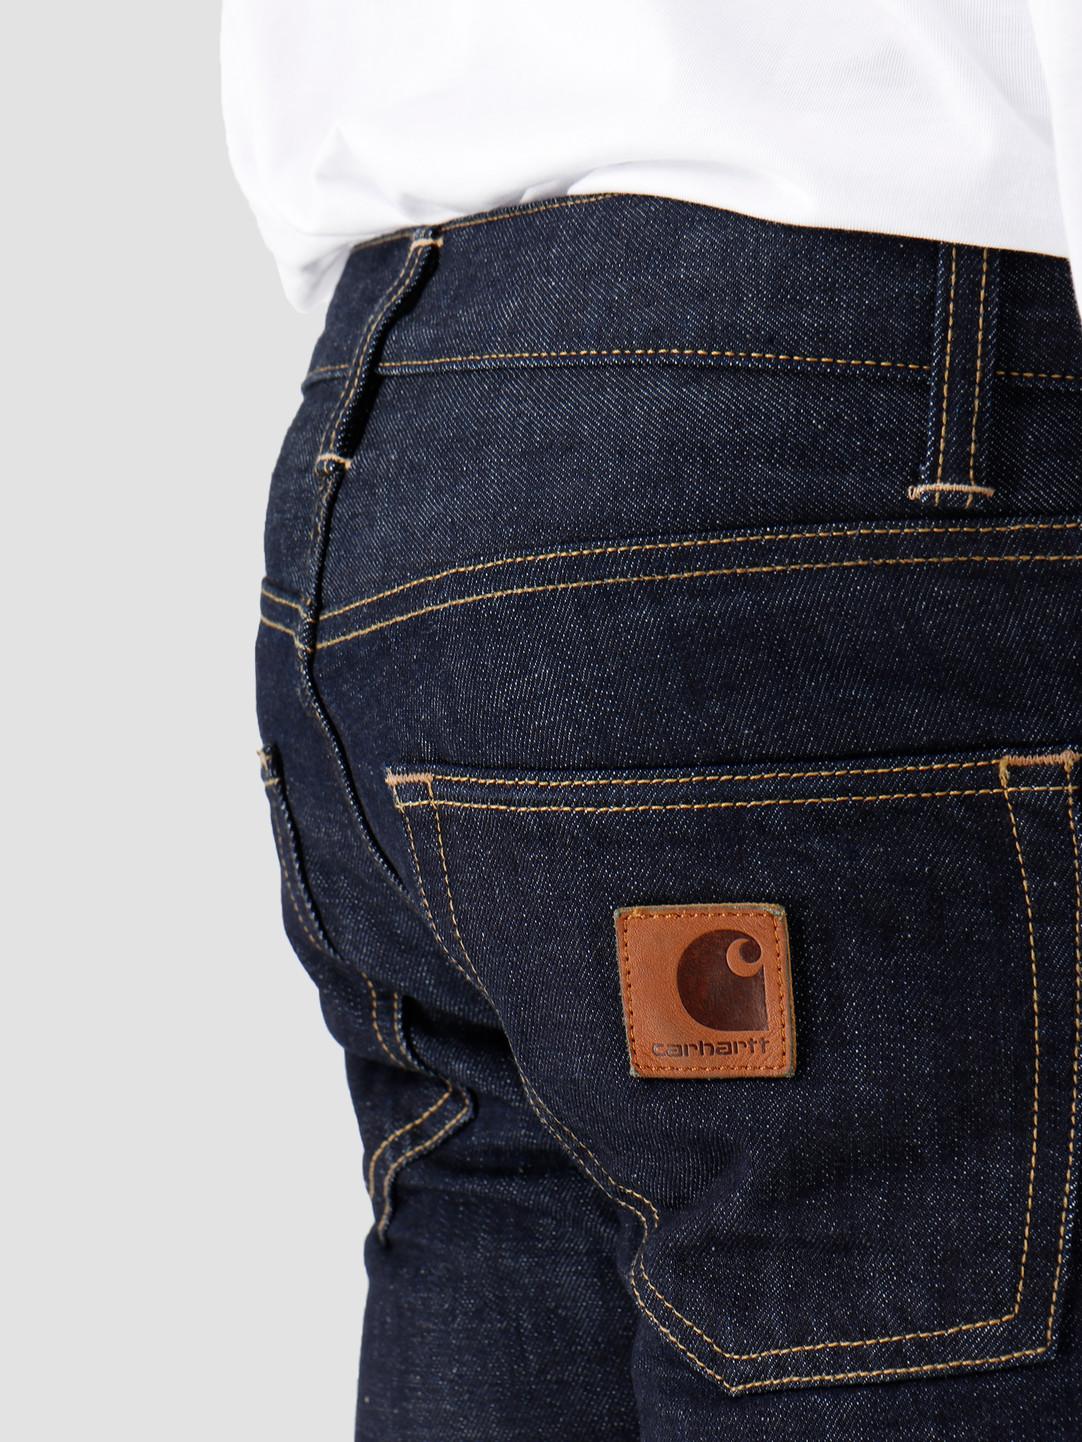 Carhartt WIP Carhartt WIP Klondike Pant Blue Rinsed I016735-102